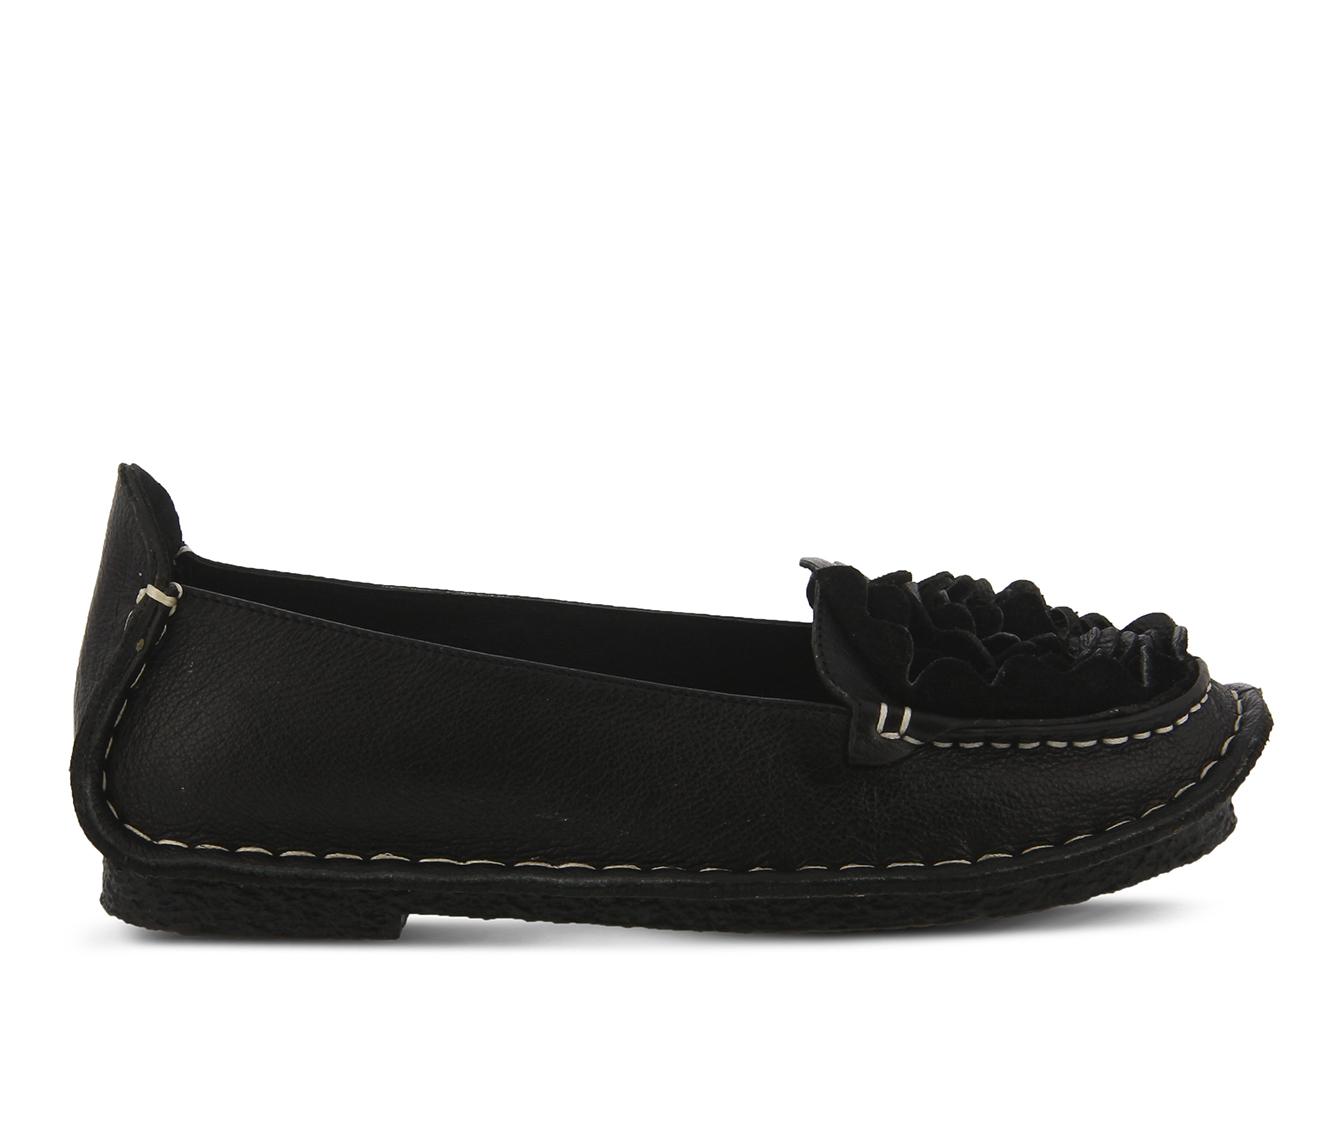 L'Artiste Dezi Women's Shoe (Black Leather)